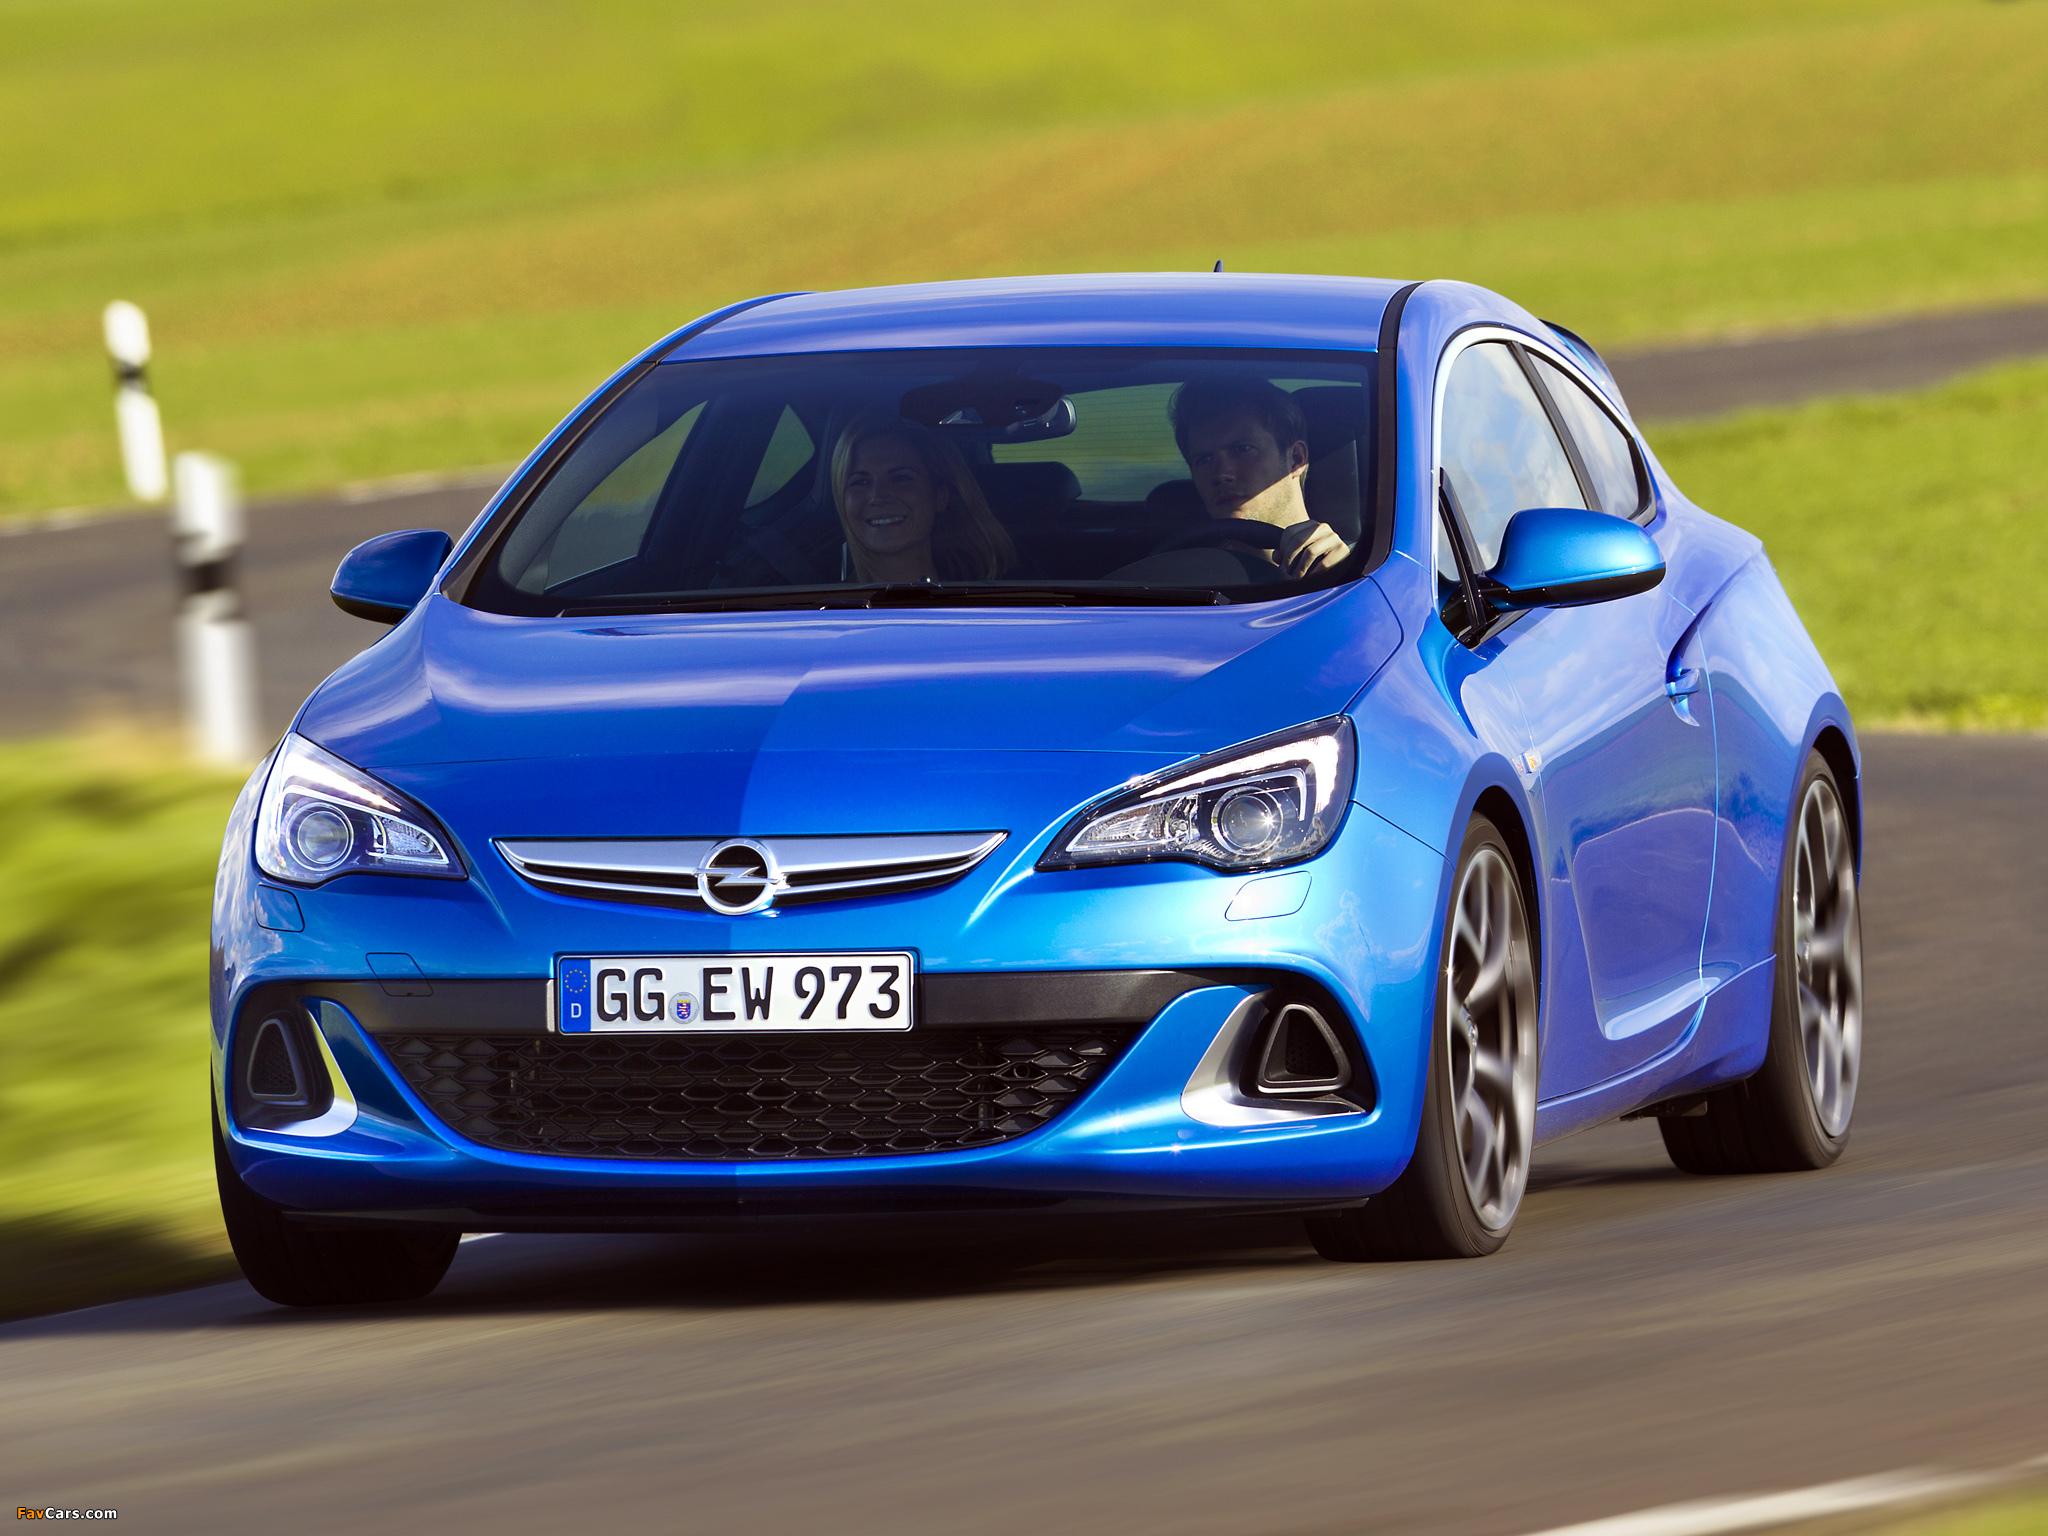 Opel Astra OPC (J) 2011 photos (2048 x 1536)